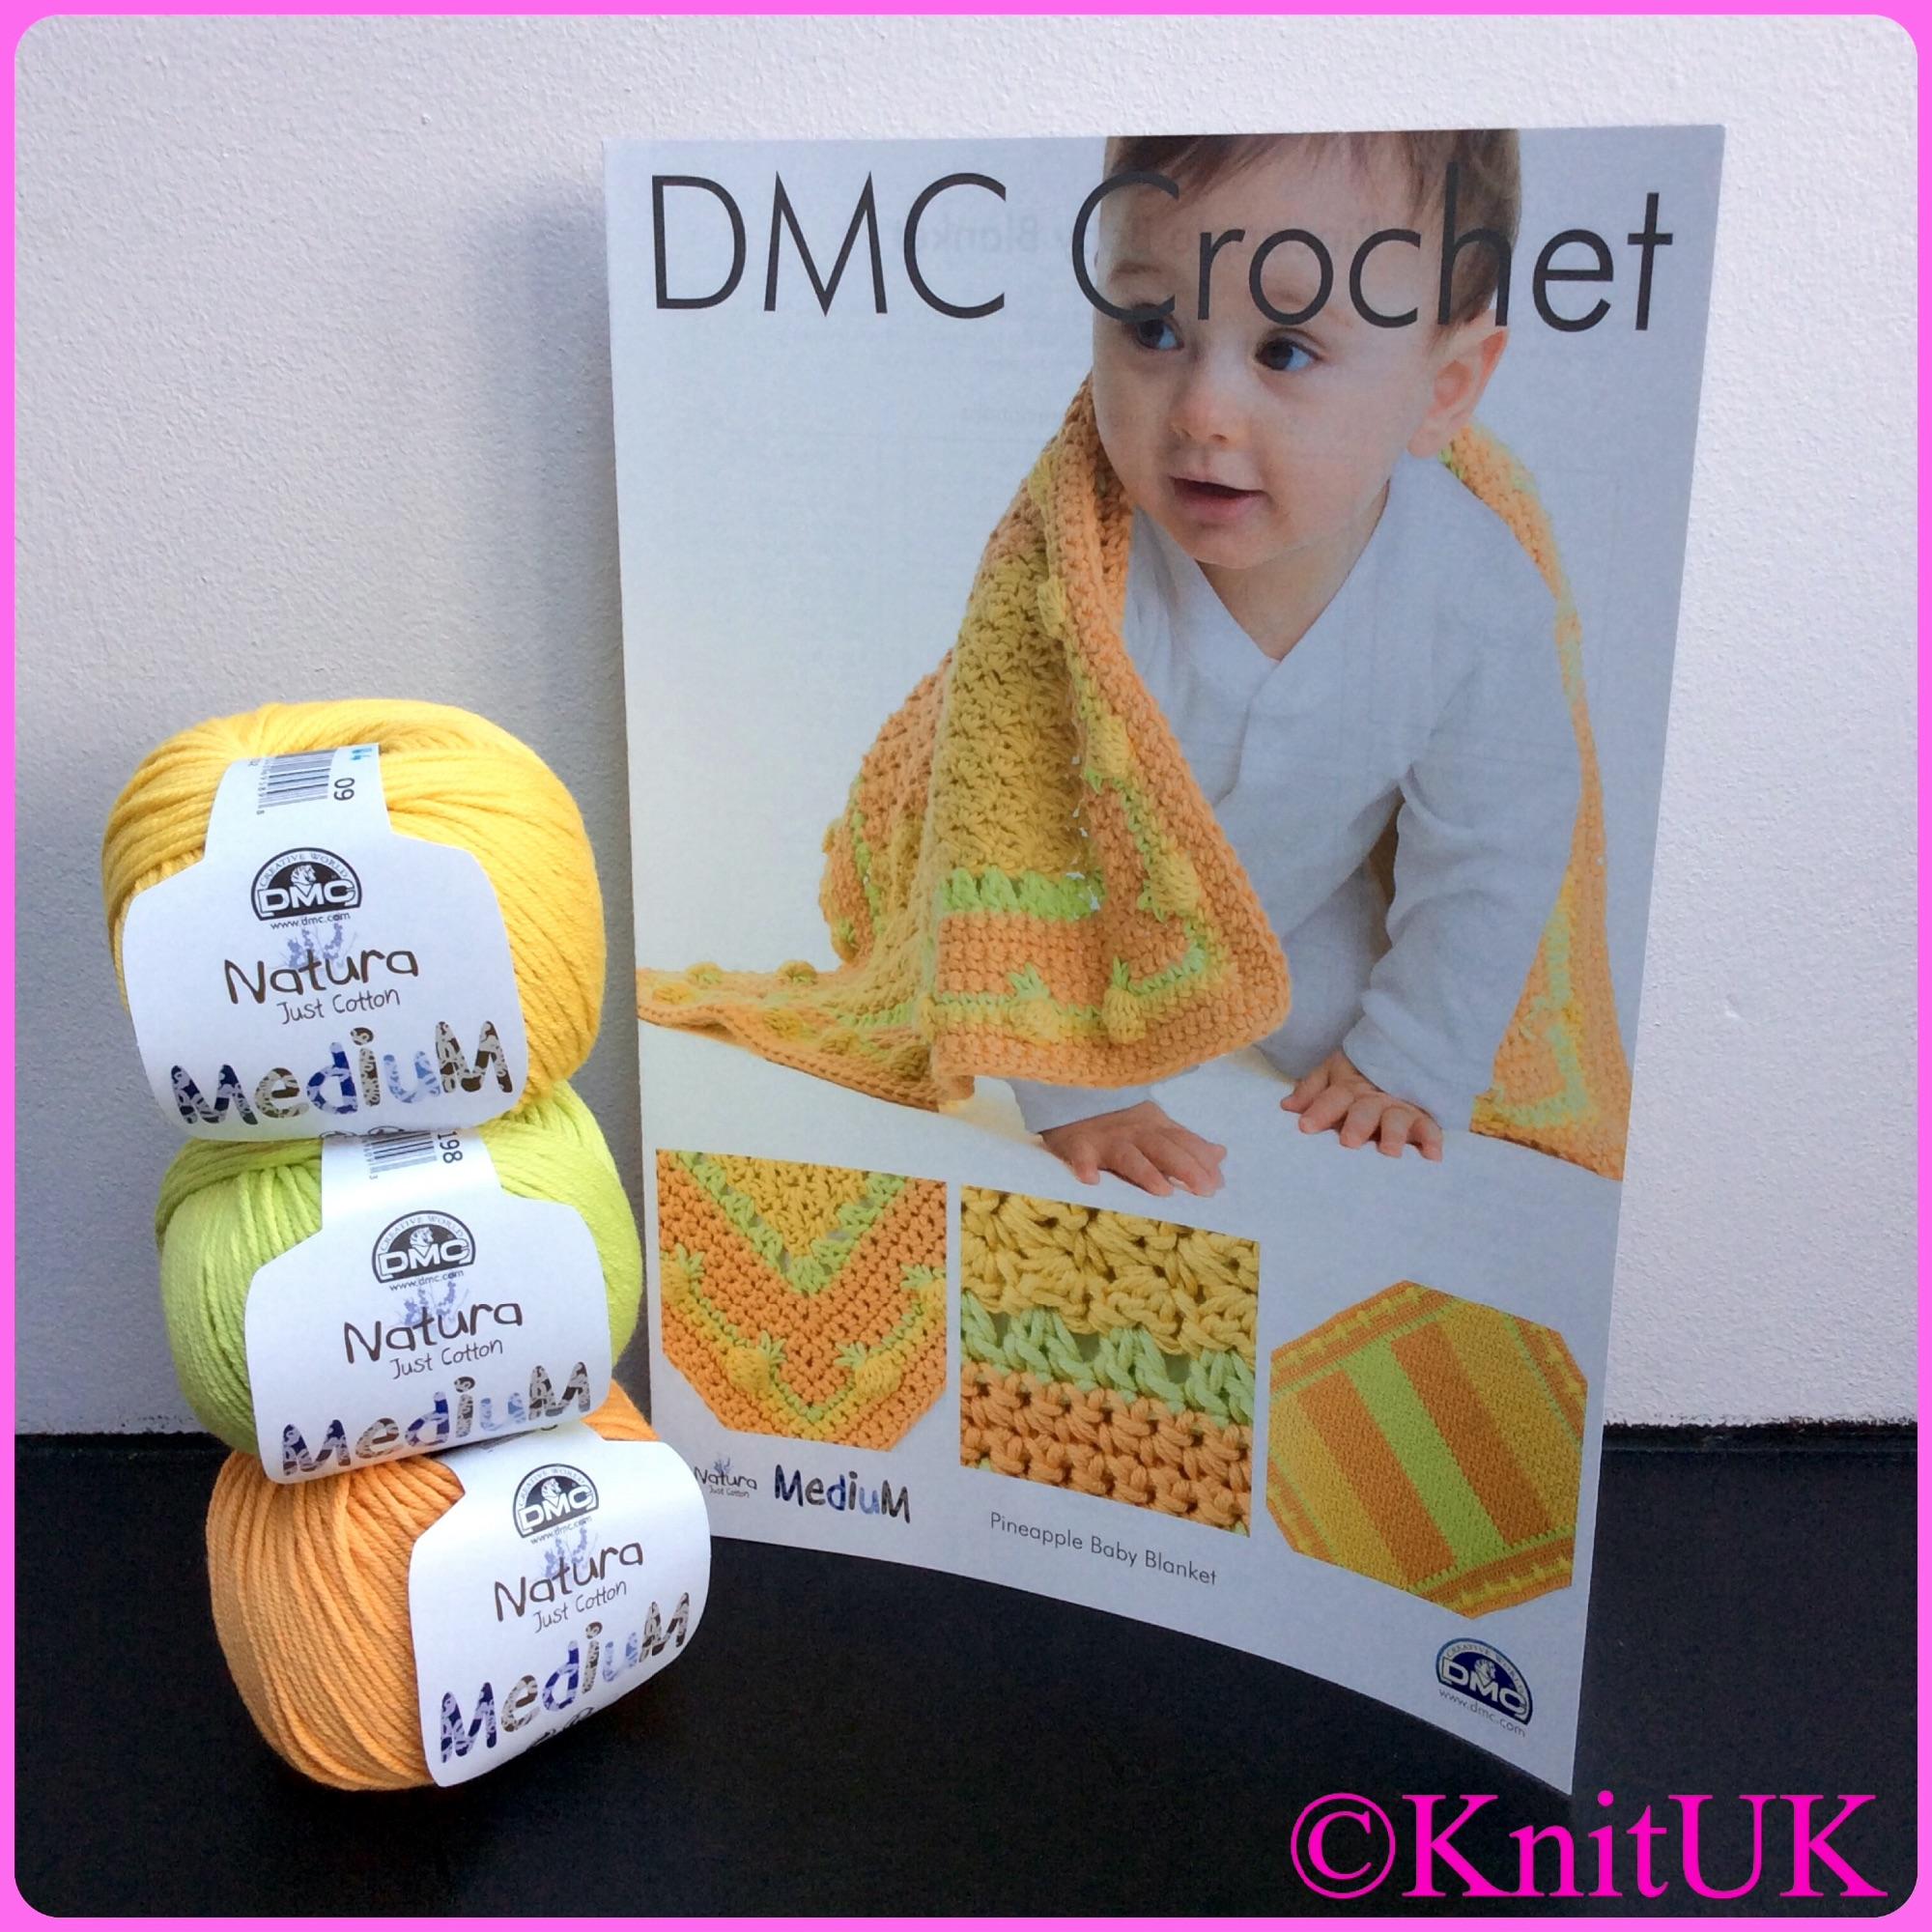 DMC crochet pattern pineapple baby blanket and natura medium yarn